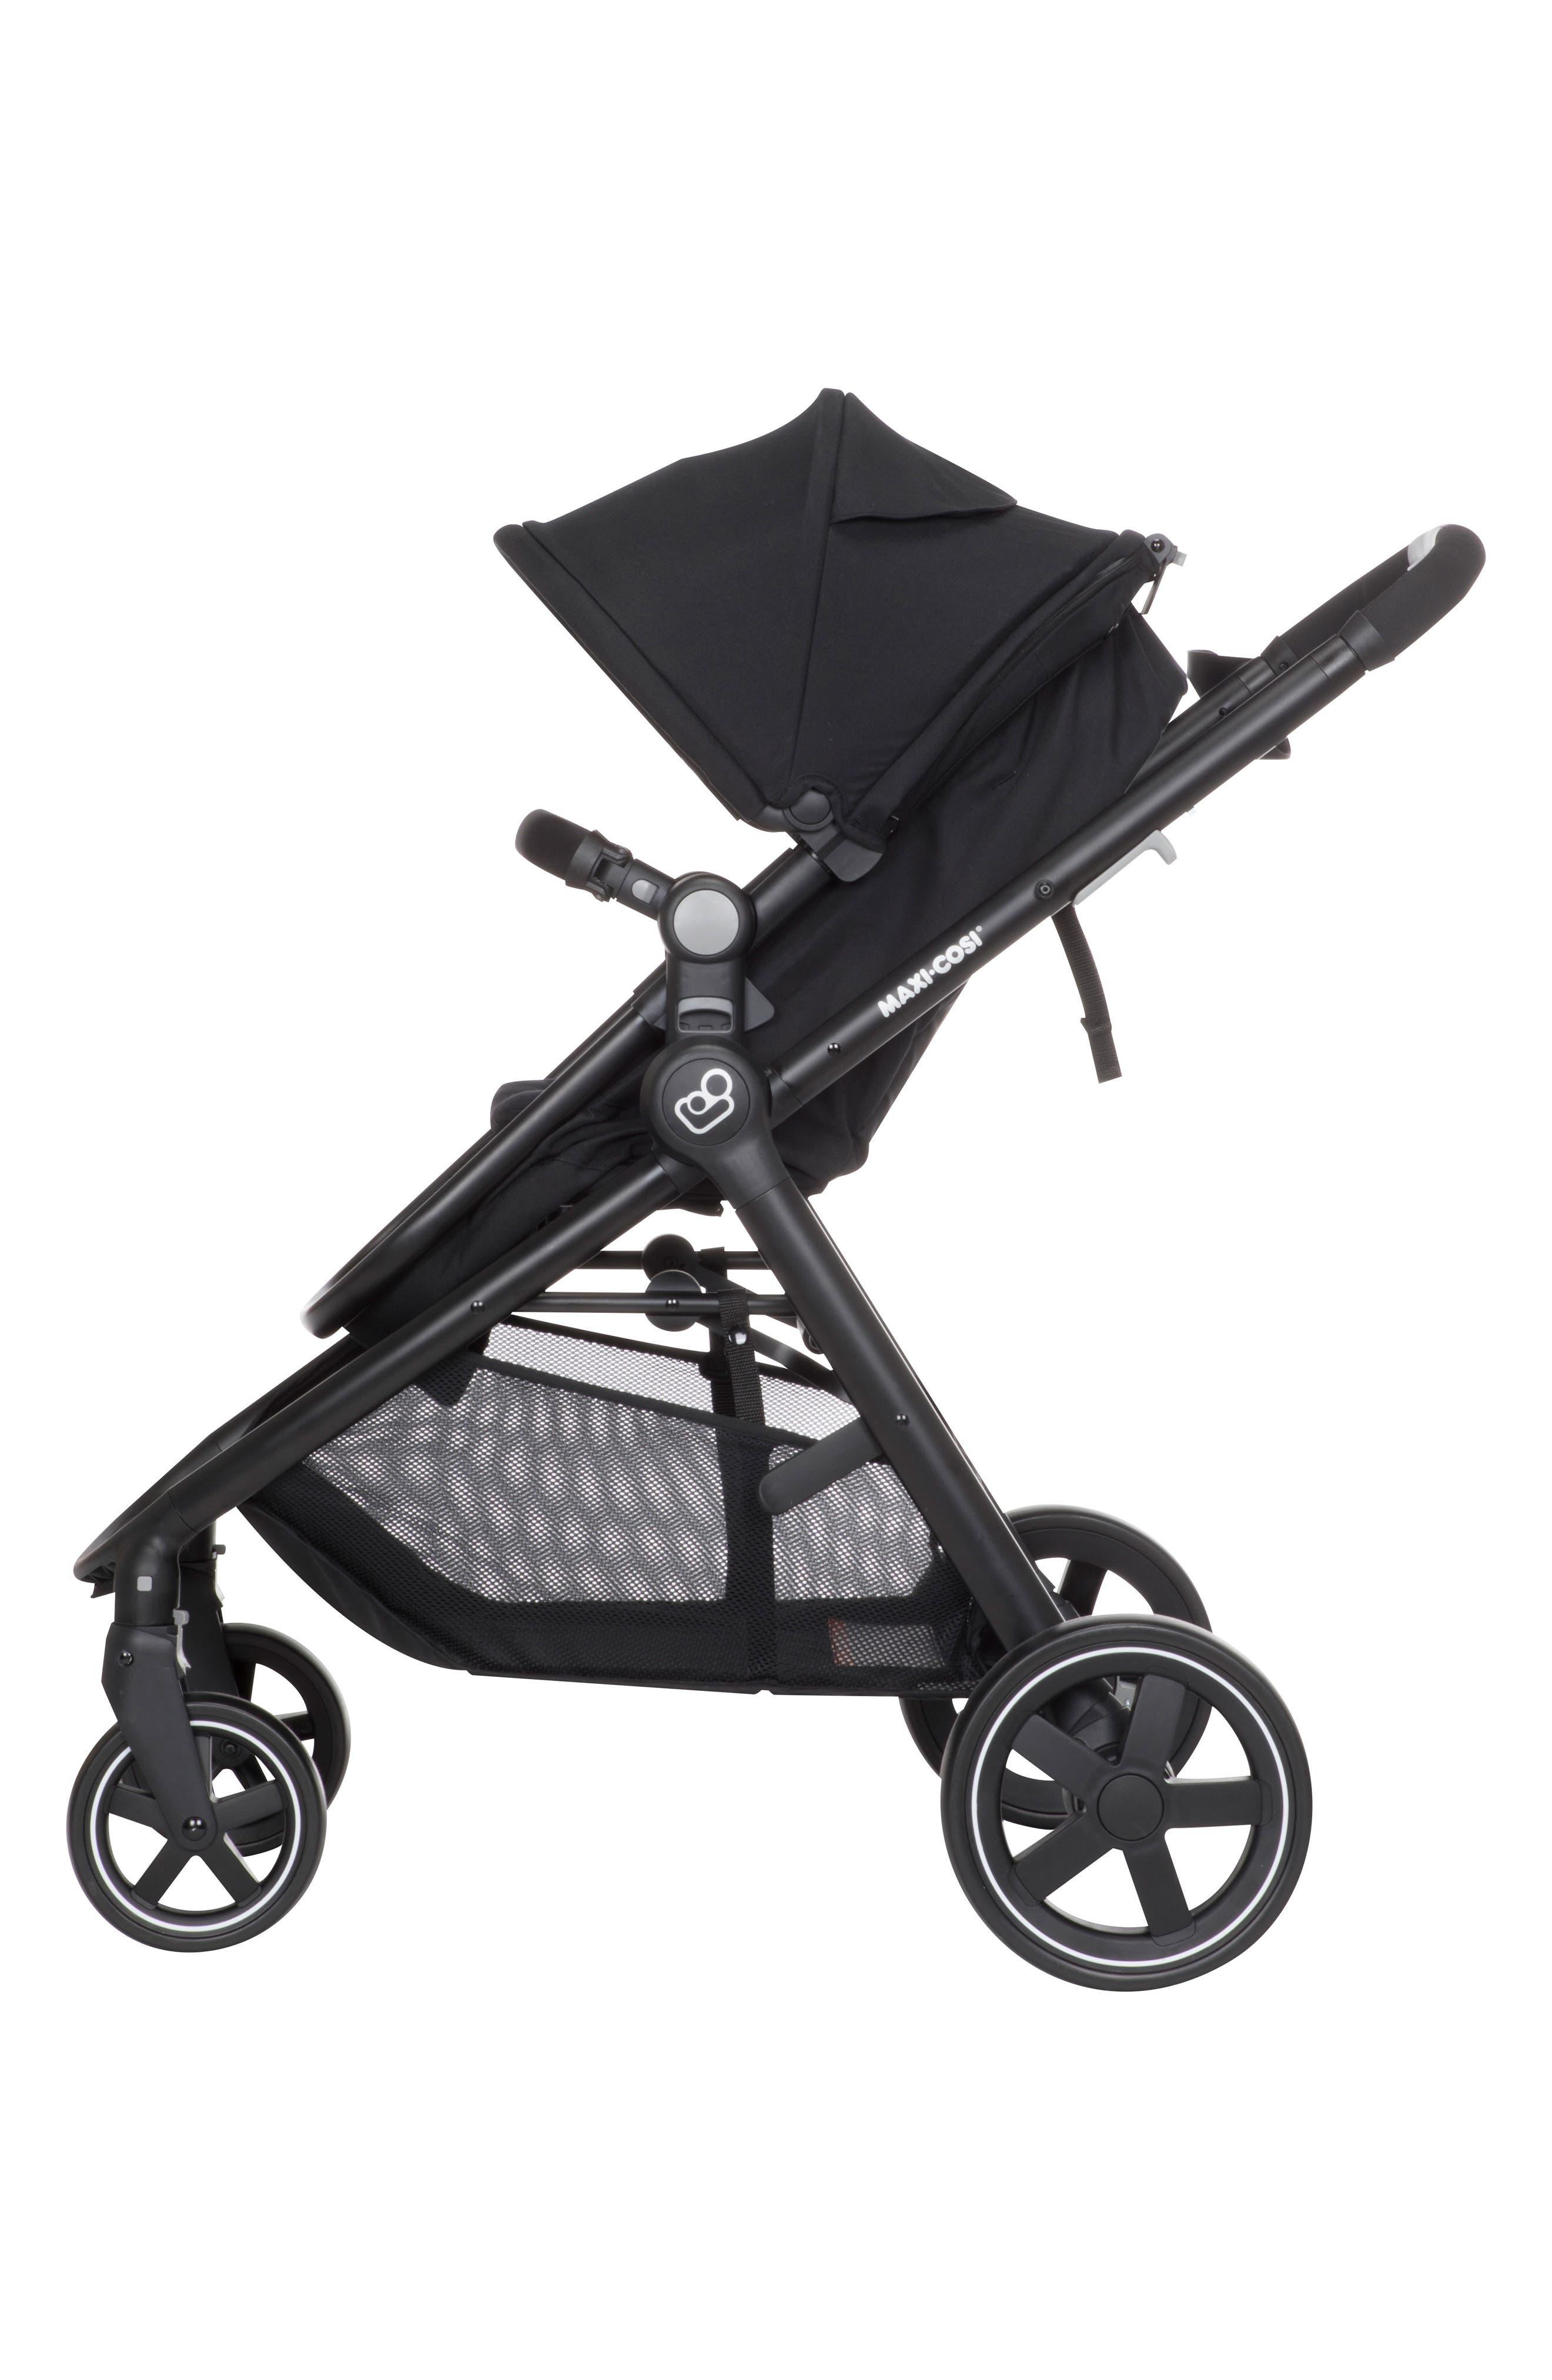 5-1 Mico 30 Infant Car Seat & Zelia Stroller Modular Travel System,                             Alternate thumbnail 11, color,                             NIGHT BLACK